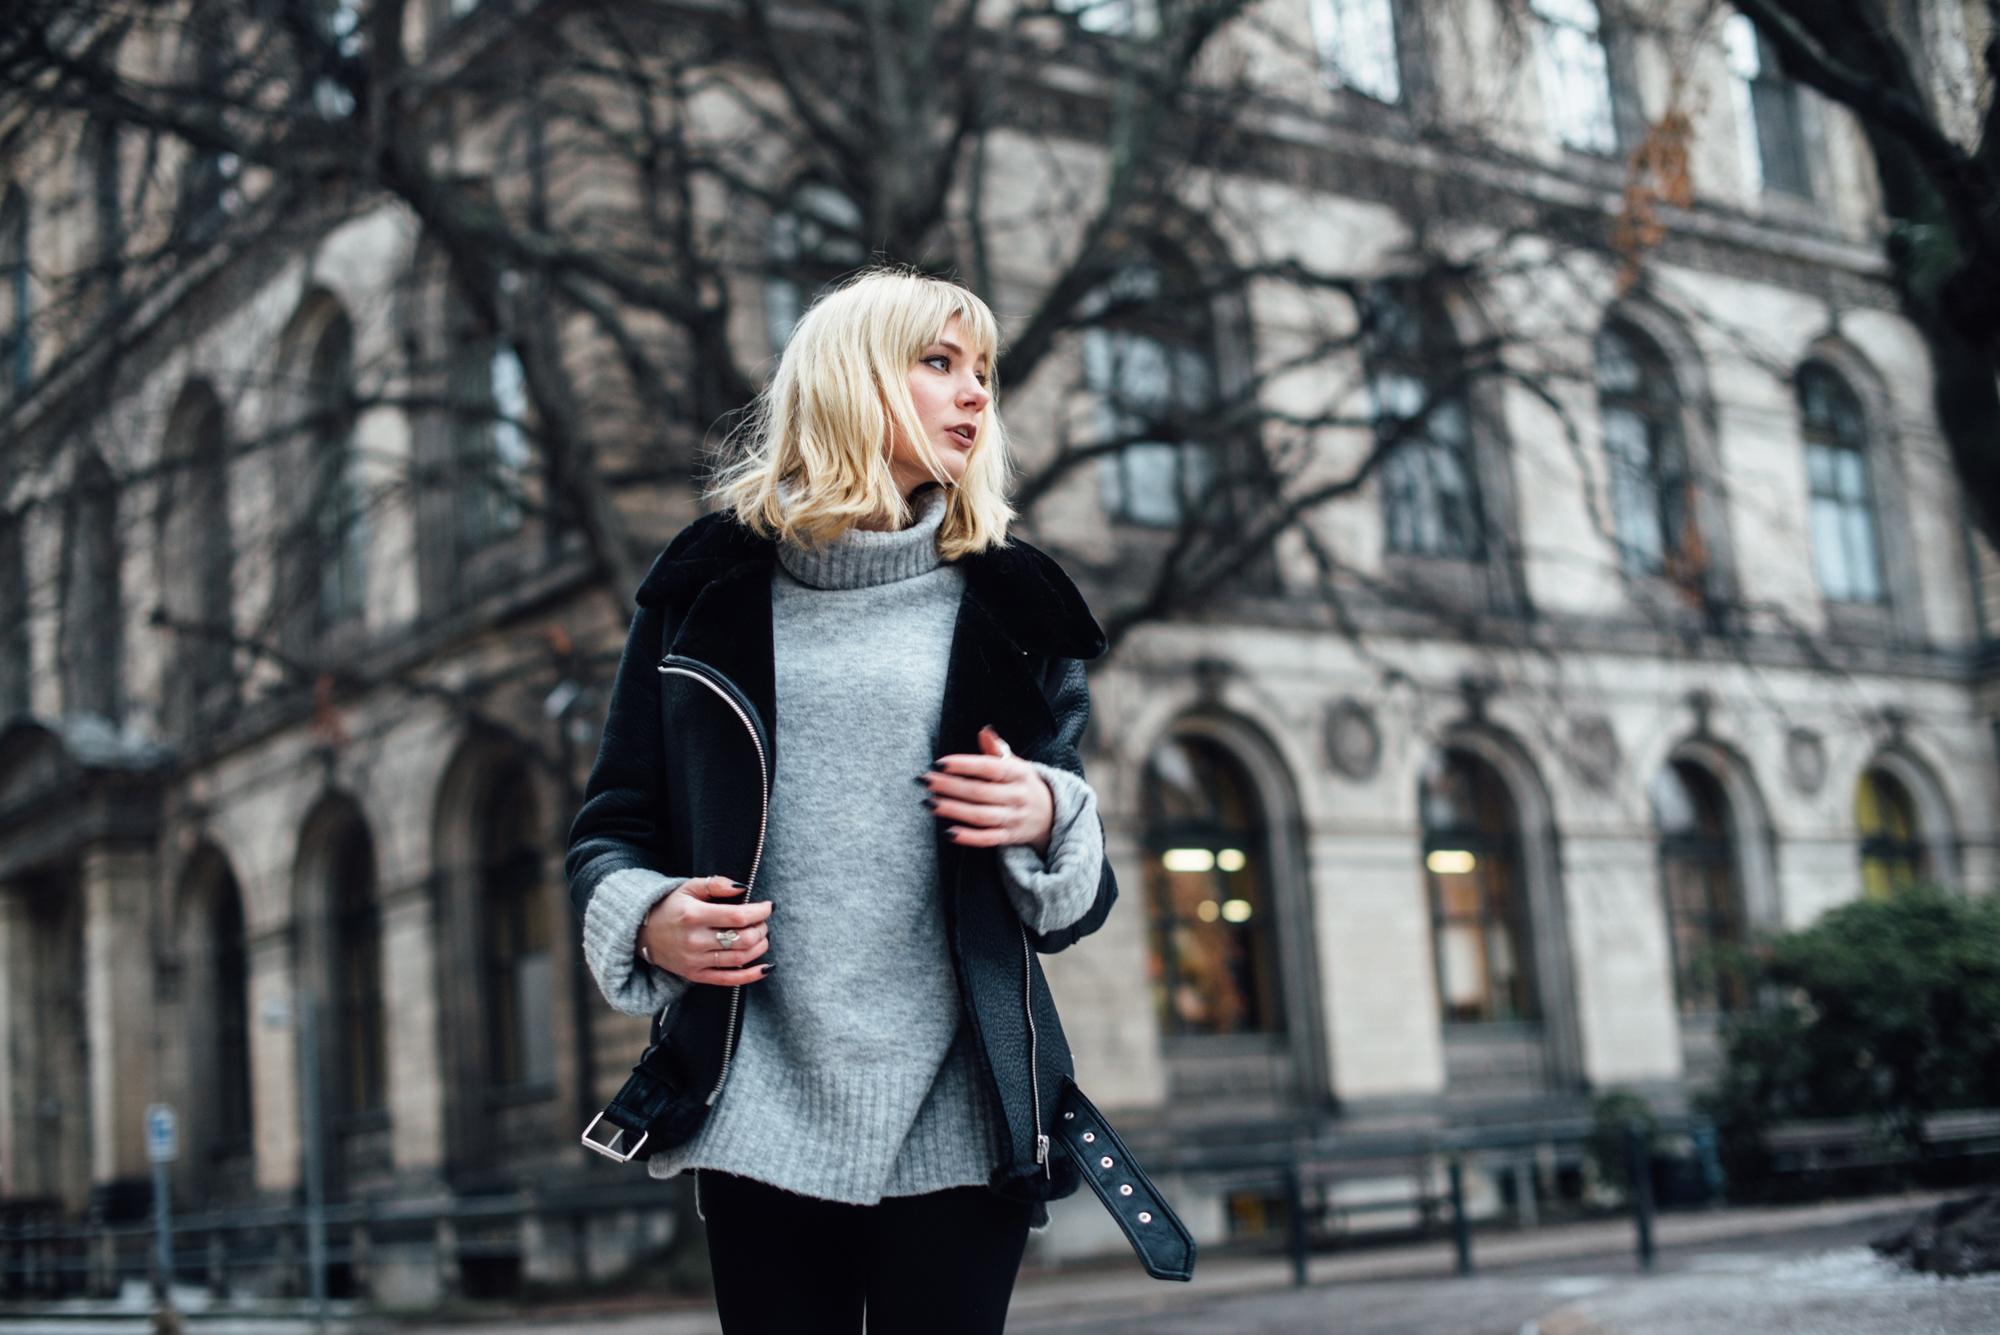 04-Kiamisu-Modeblog-Fashion Week Berlin_Shearling Jacke-17